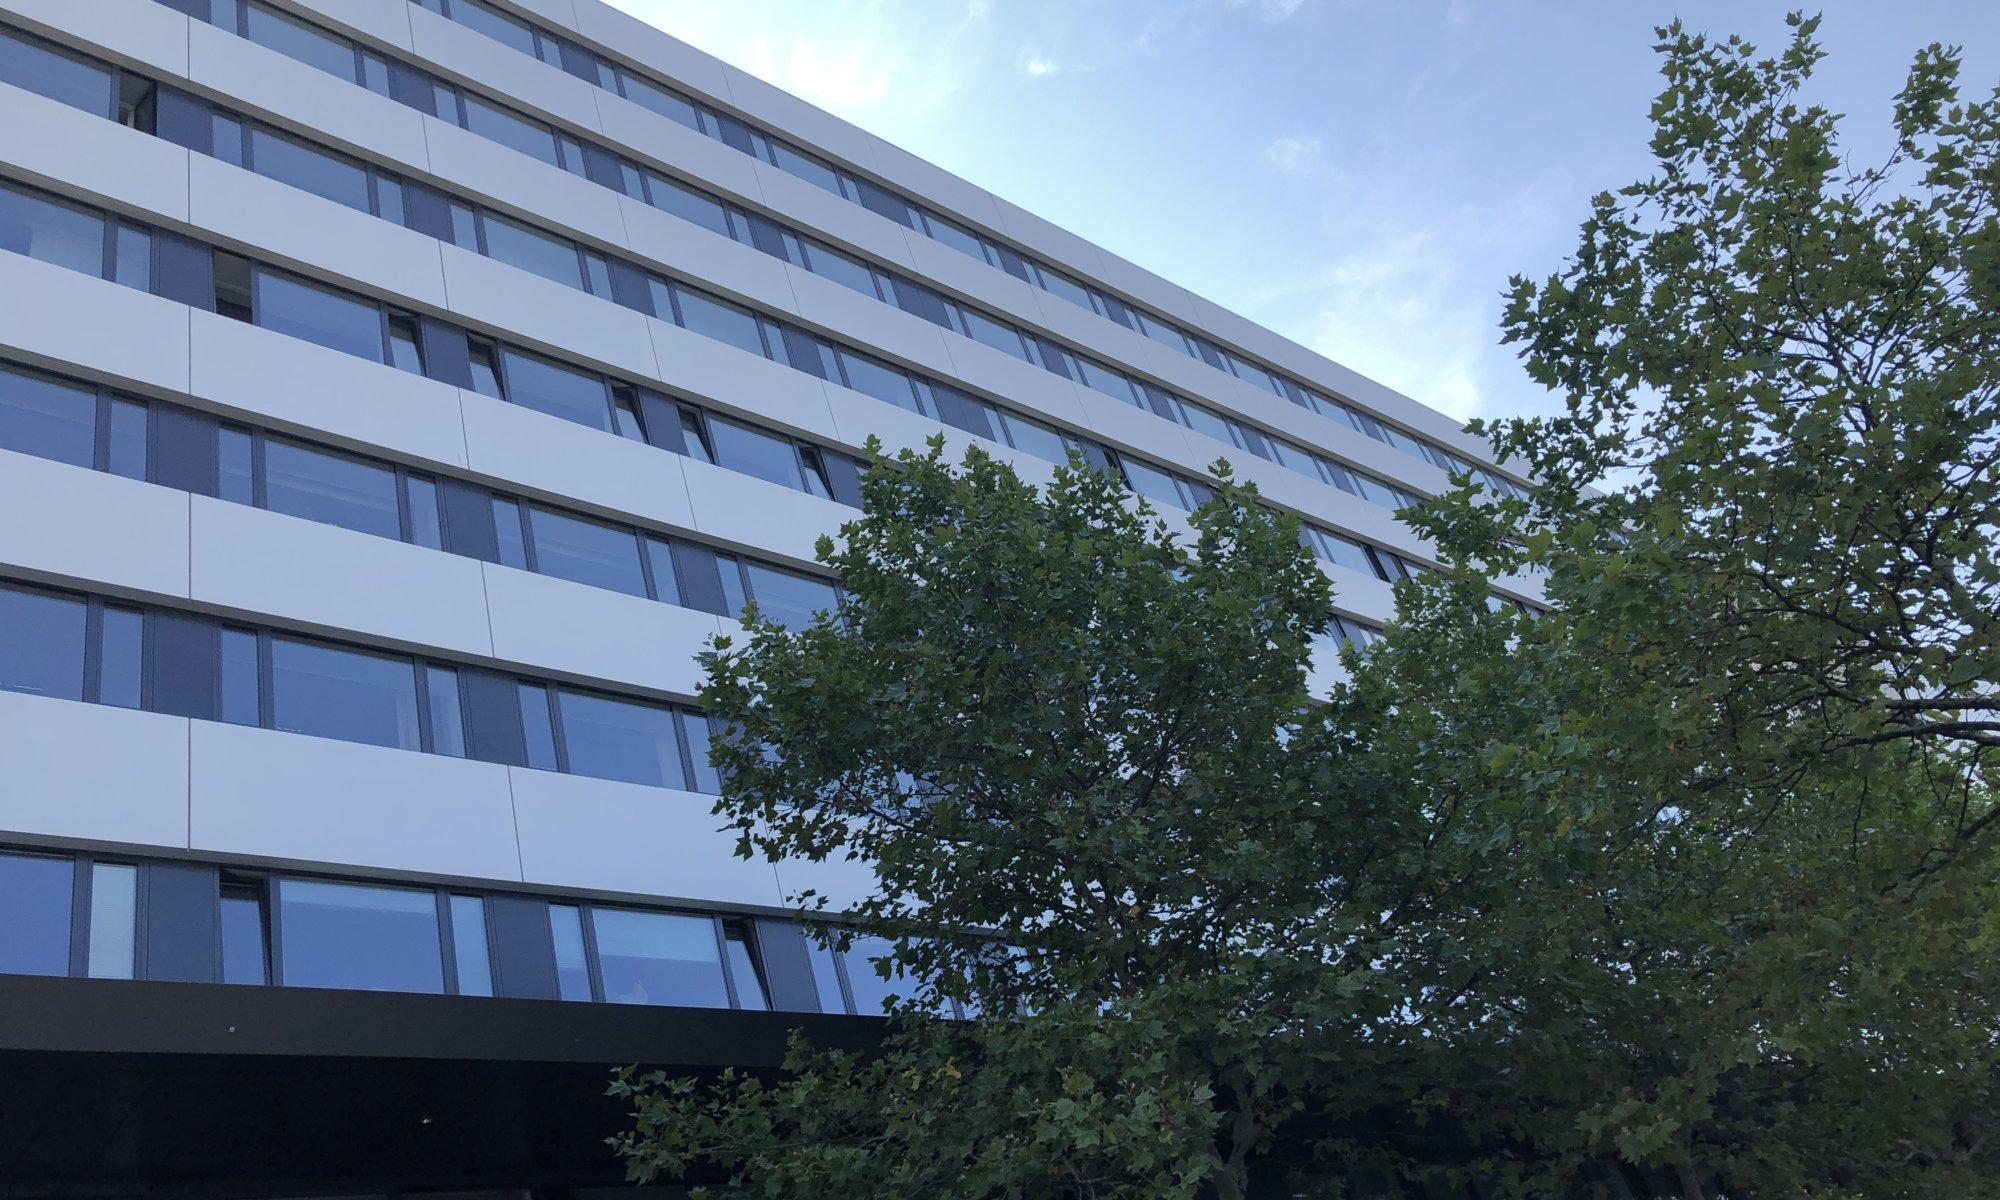 Hotel Biendo, Chemnitz